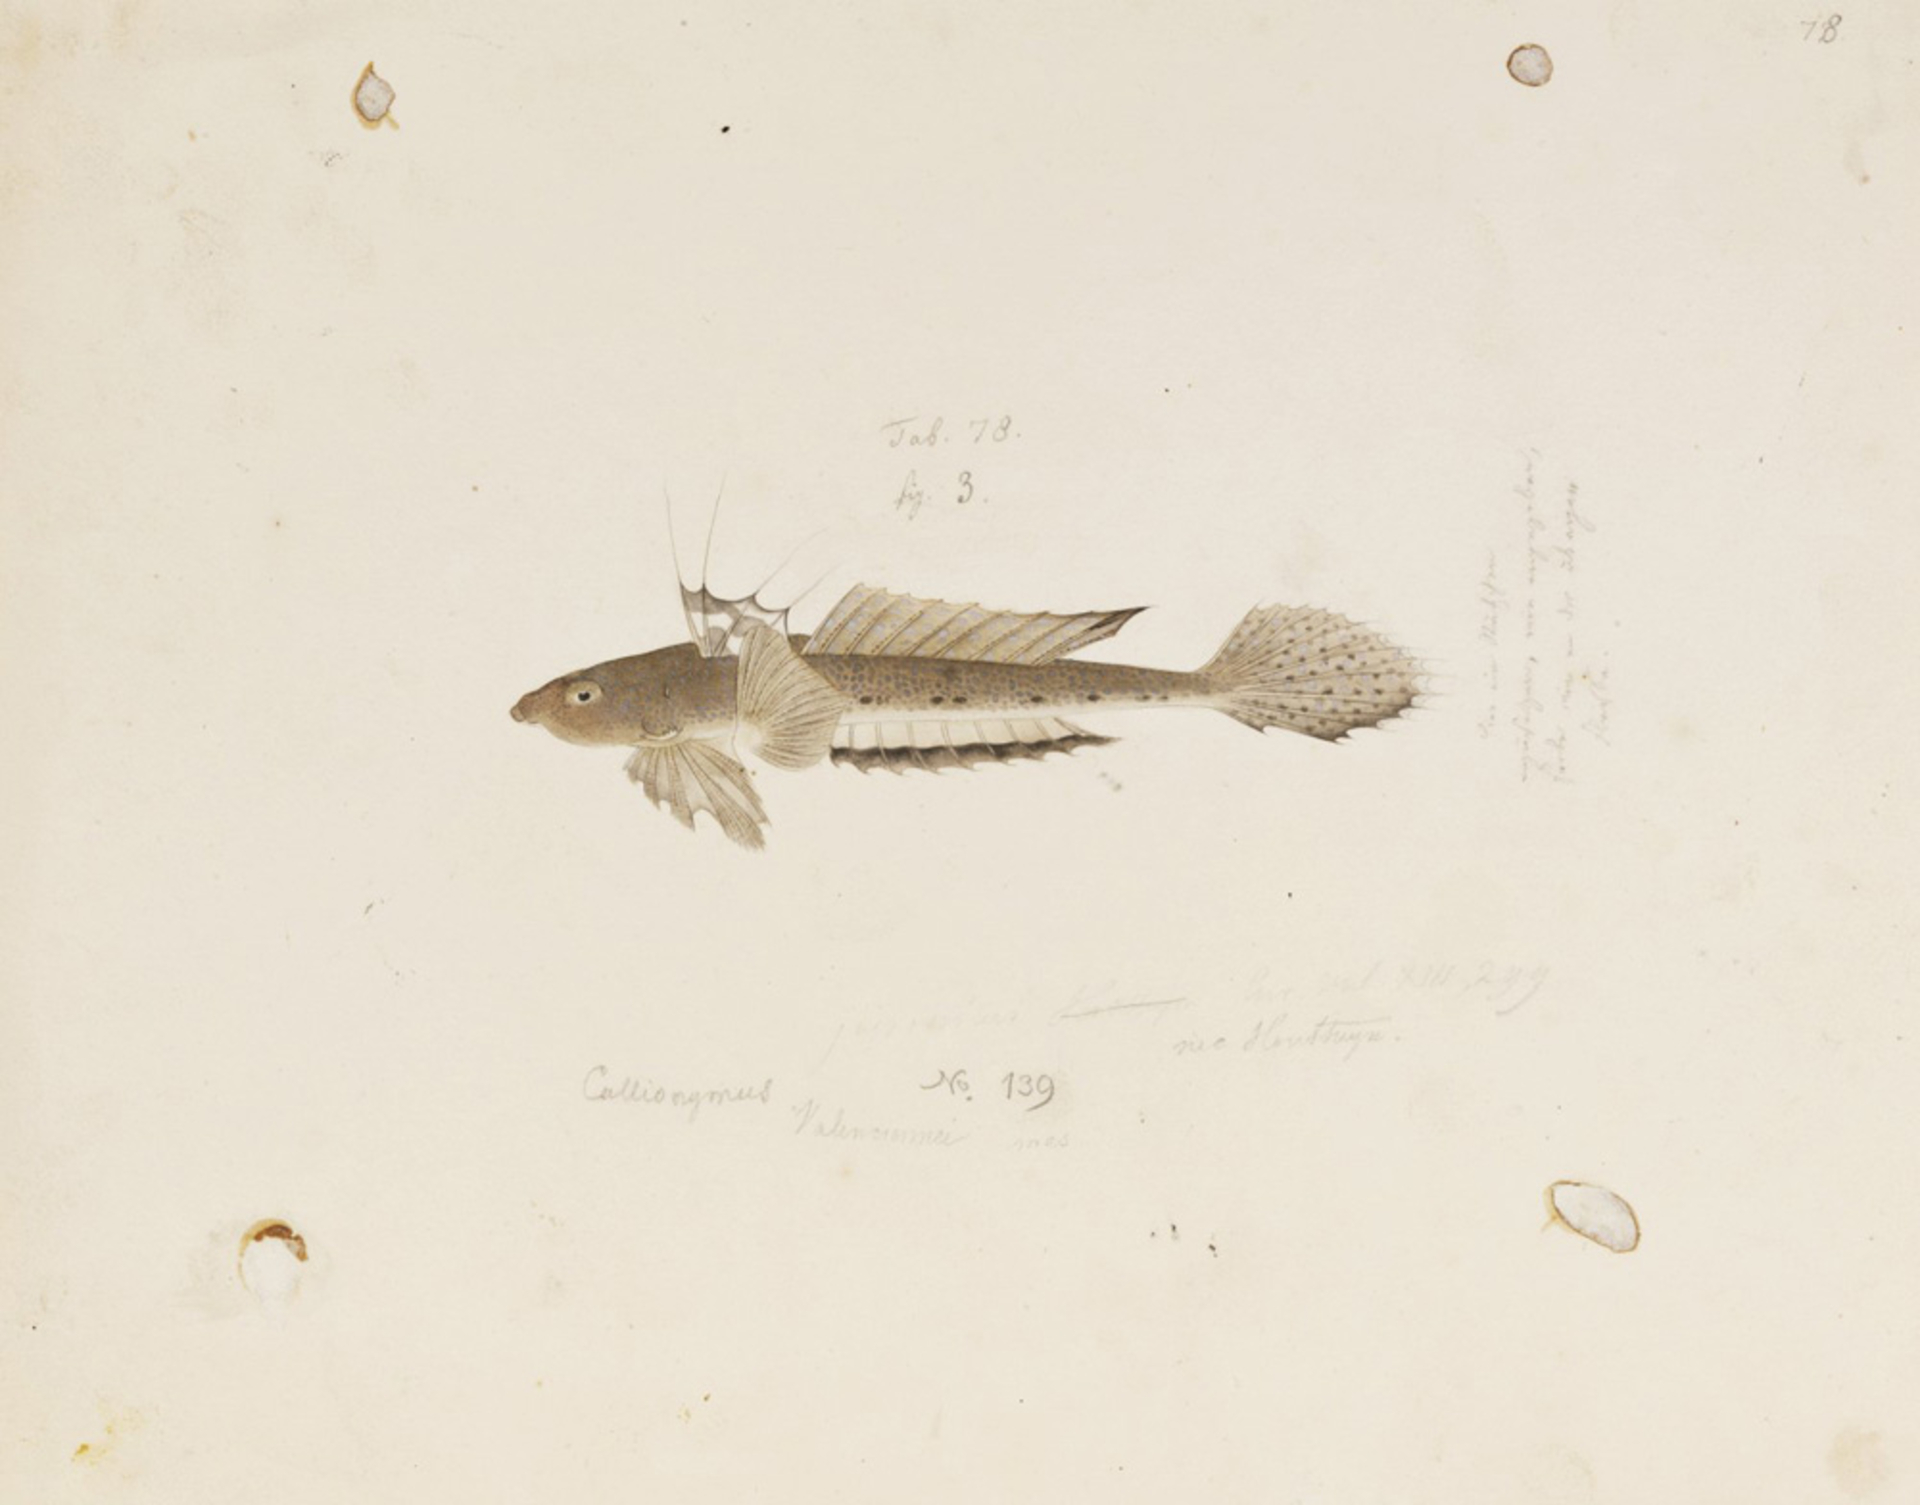 RMNH.ART.815 | Callionymus valenciennei